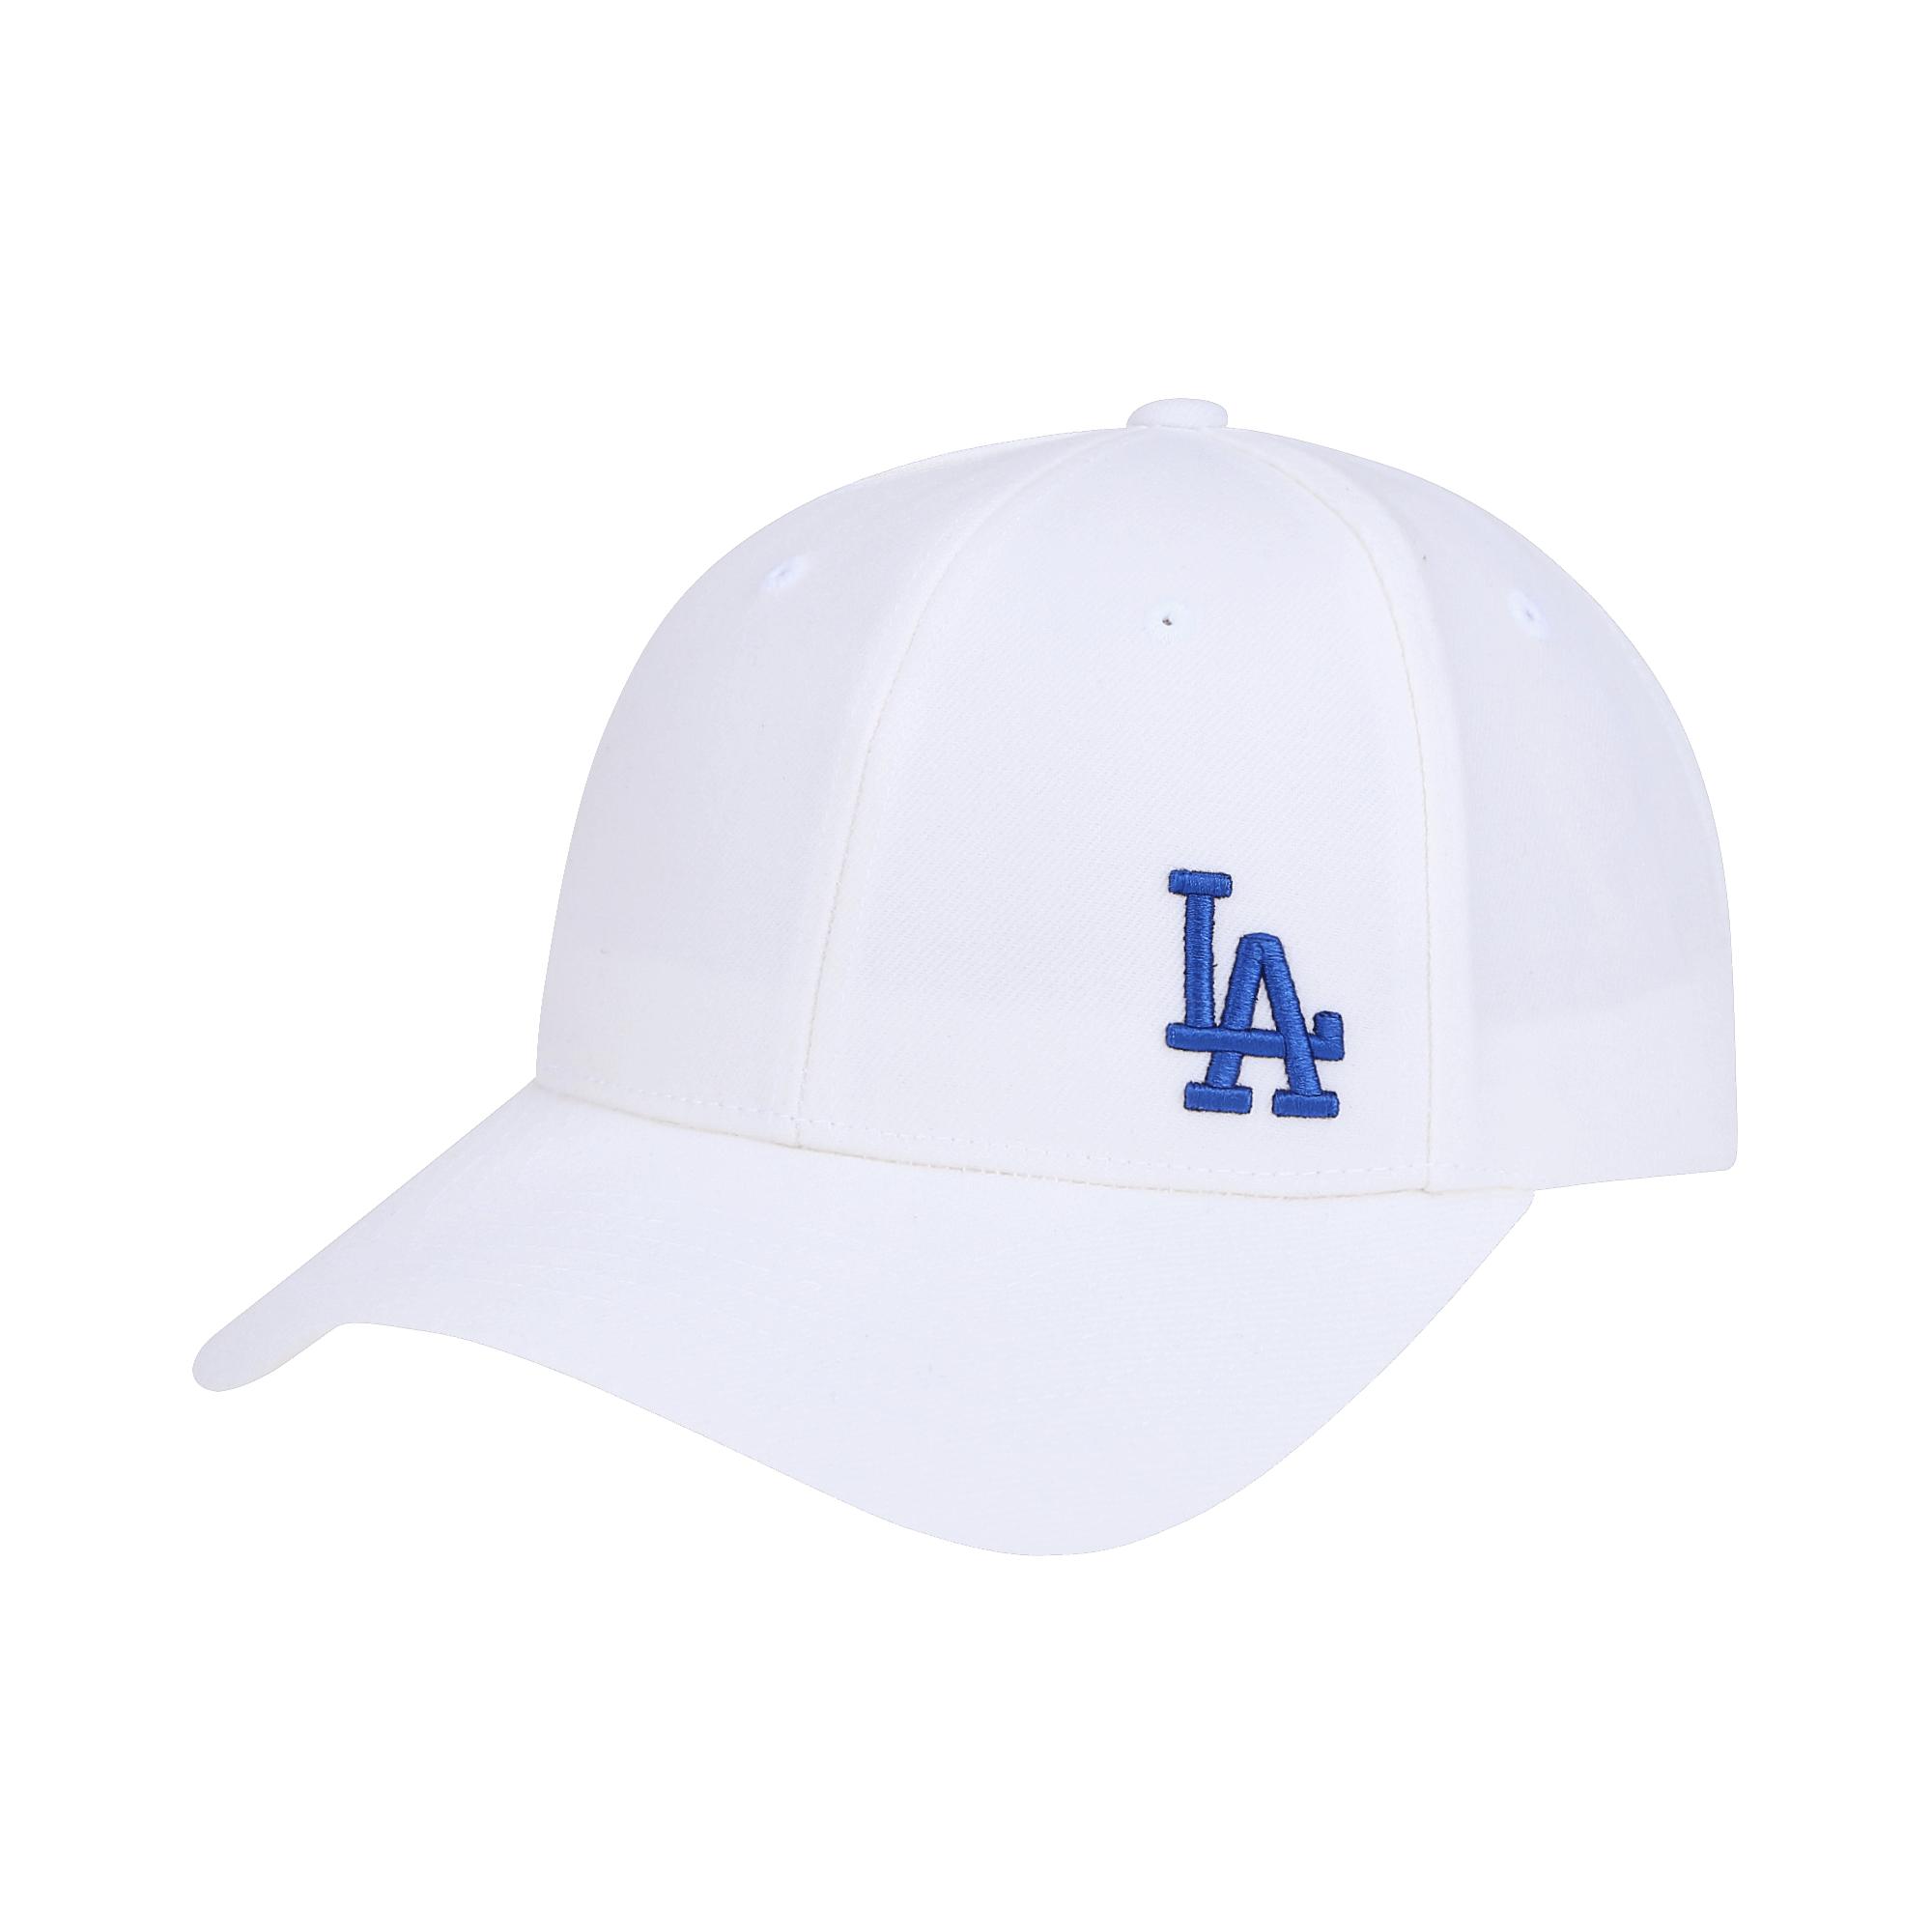 LA DODGERS AUTHENTIC SMALL LOGO ADJUSTABLE CAP